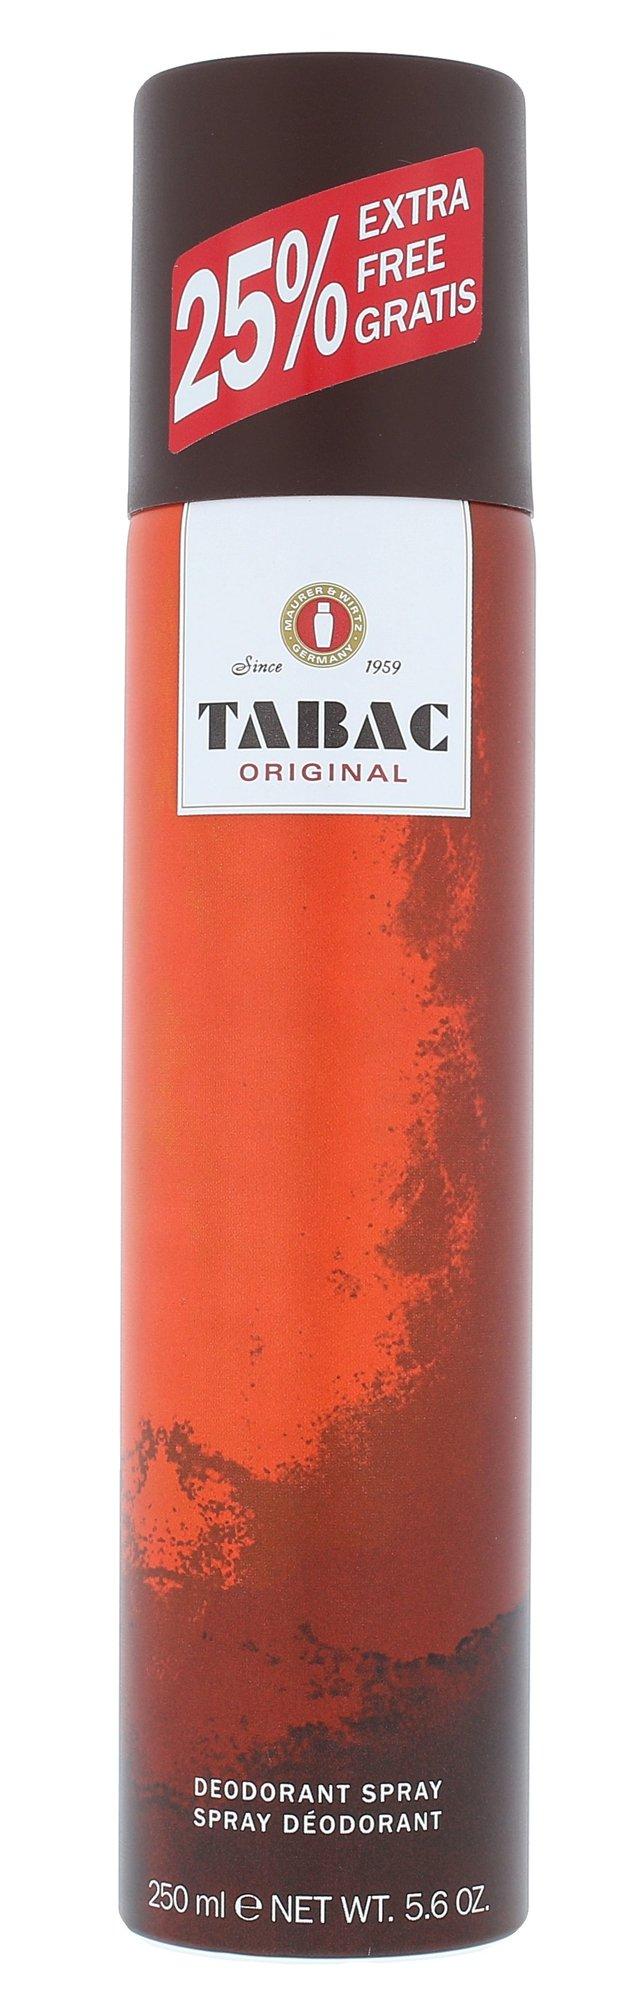 Tabac Original Deodorant 250ml